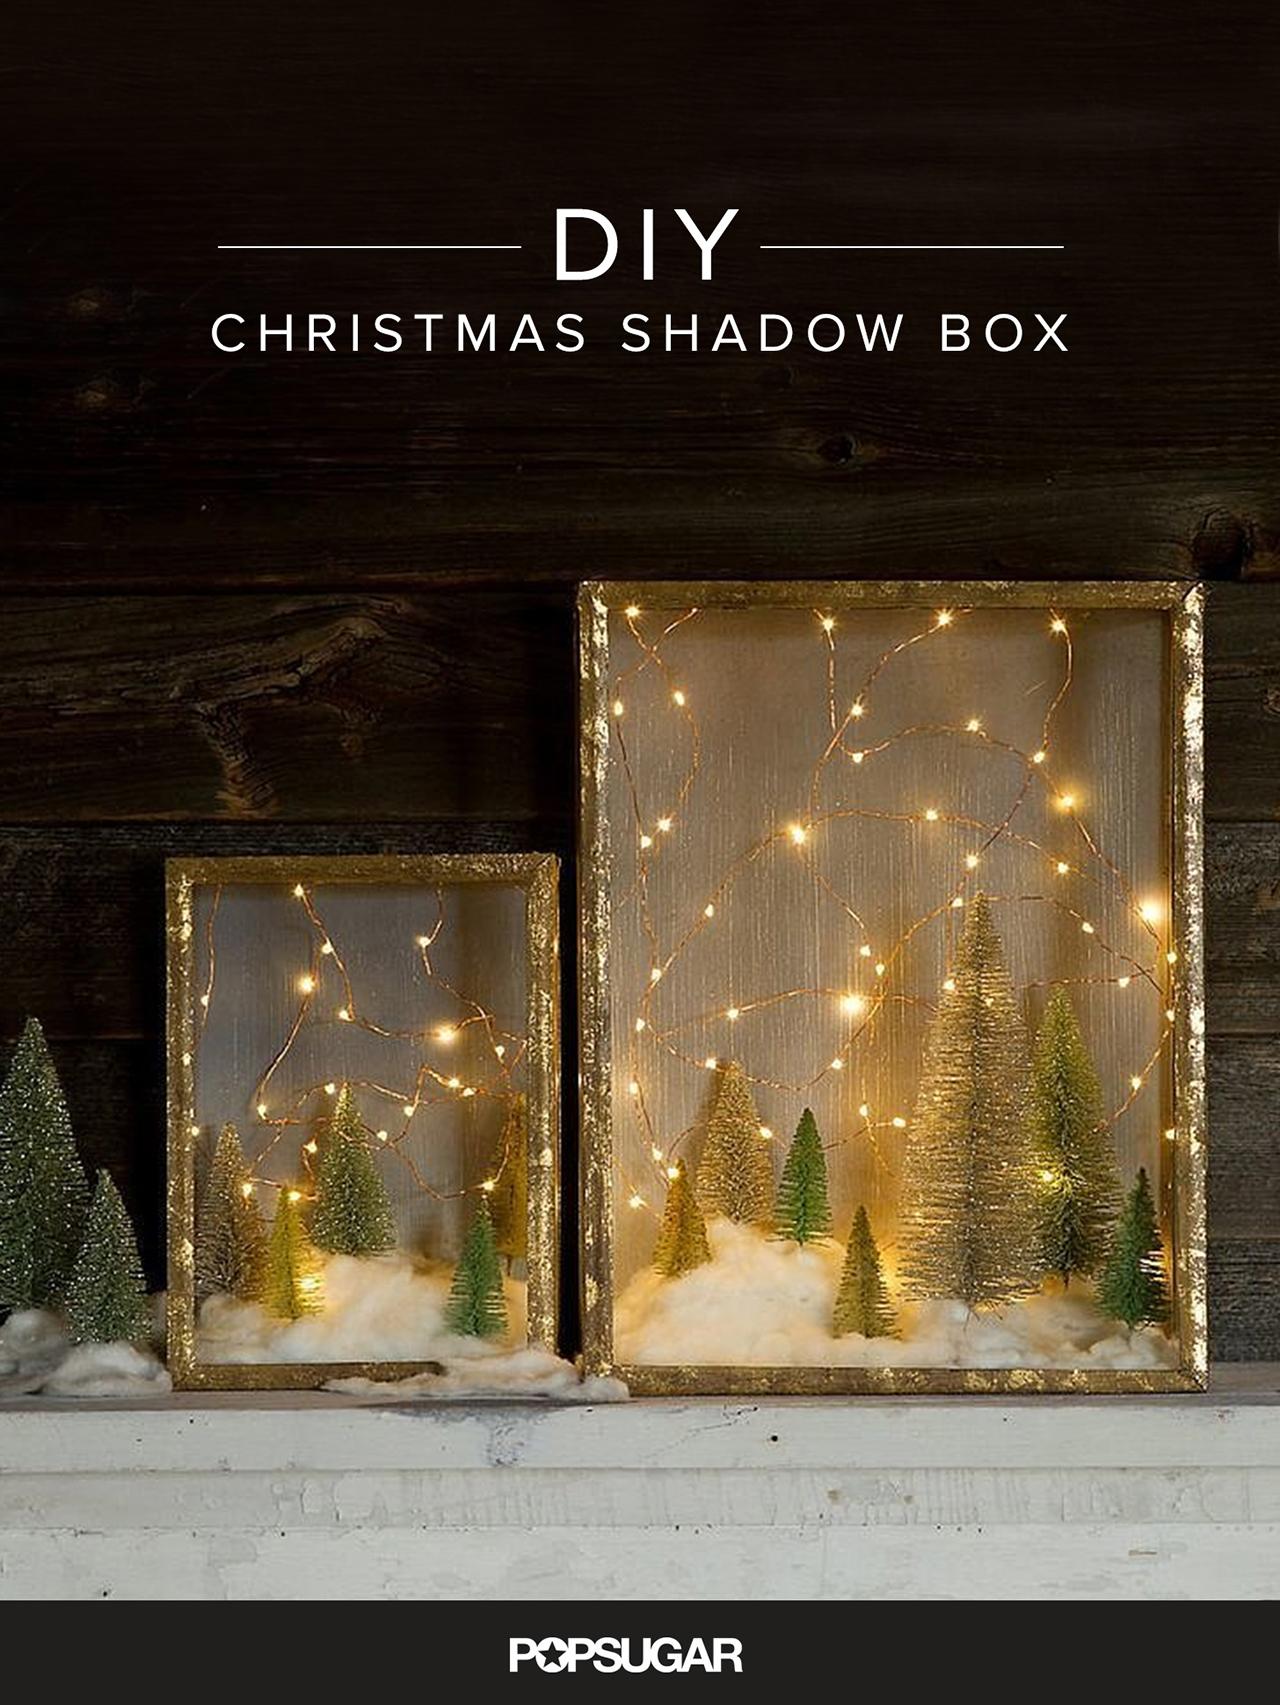 diy christmas shadow box display - Christmas Lights Decoration Ideas